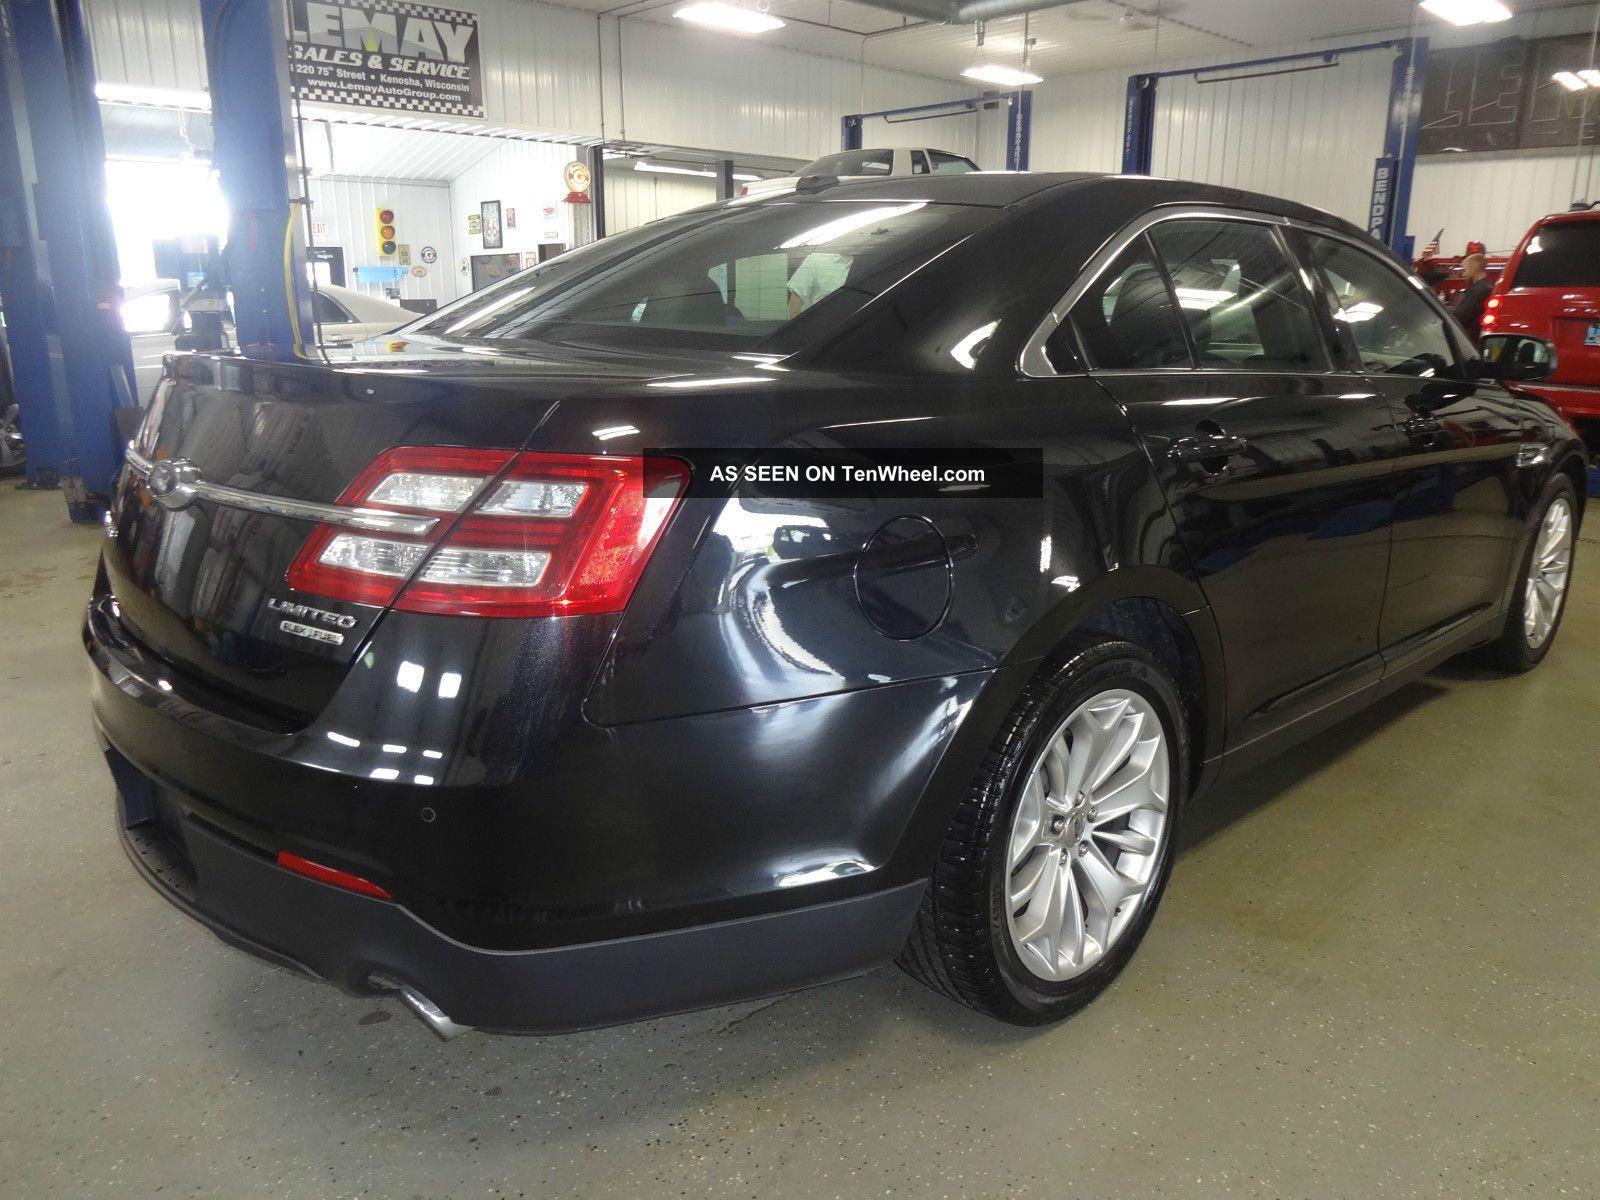 2013 ford taurus limited sedan 4 door 3 5l black. Black Bedroom Furniture Sets. Home Design Ideas